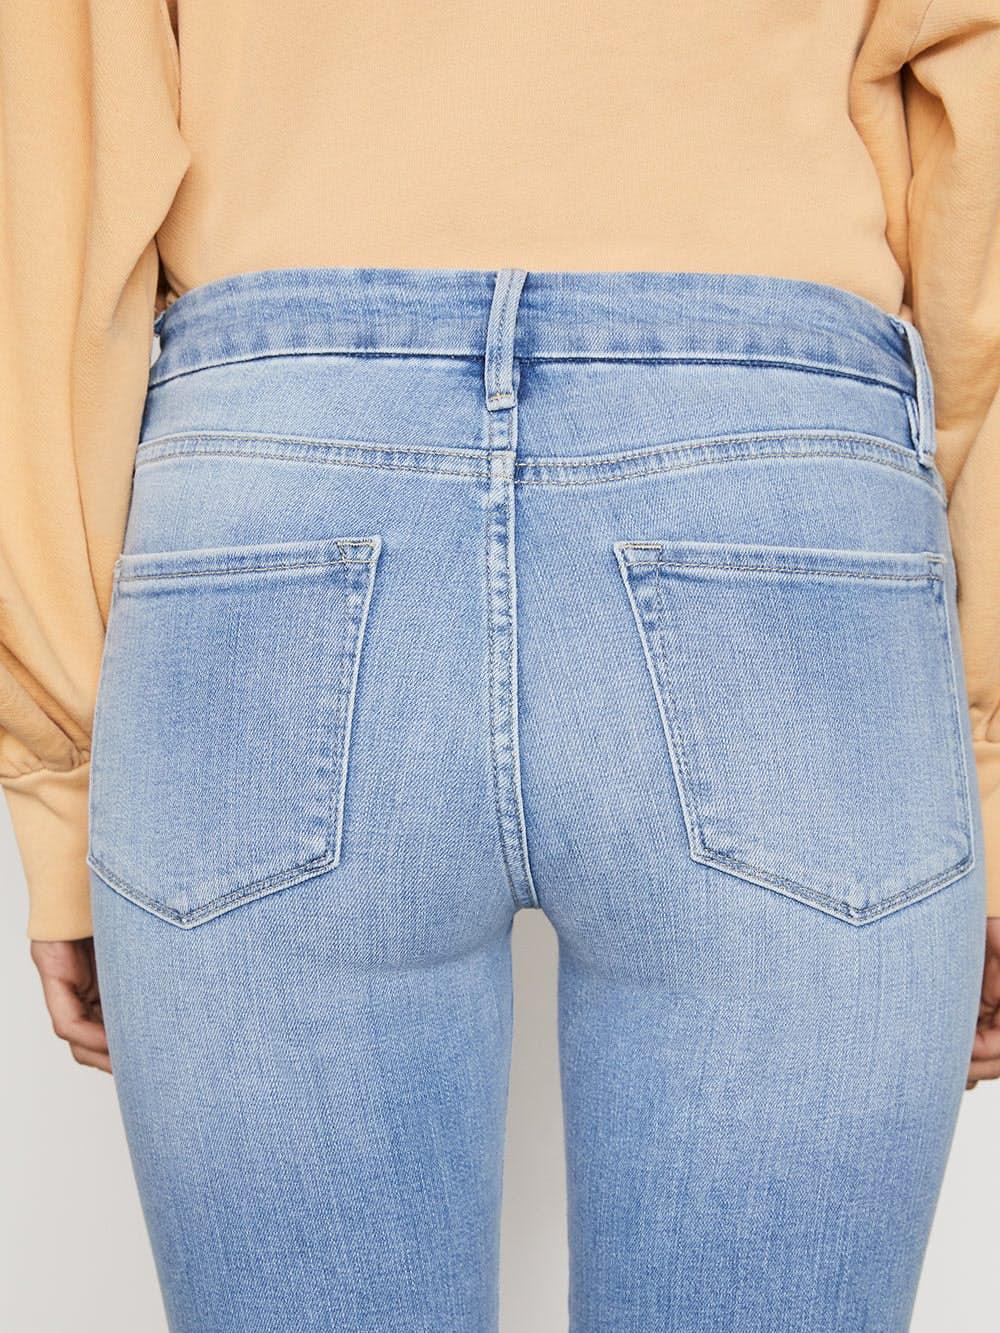 jeans back detail view alt:hover